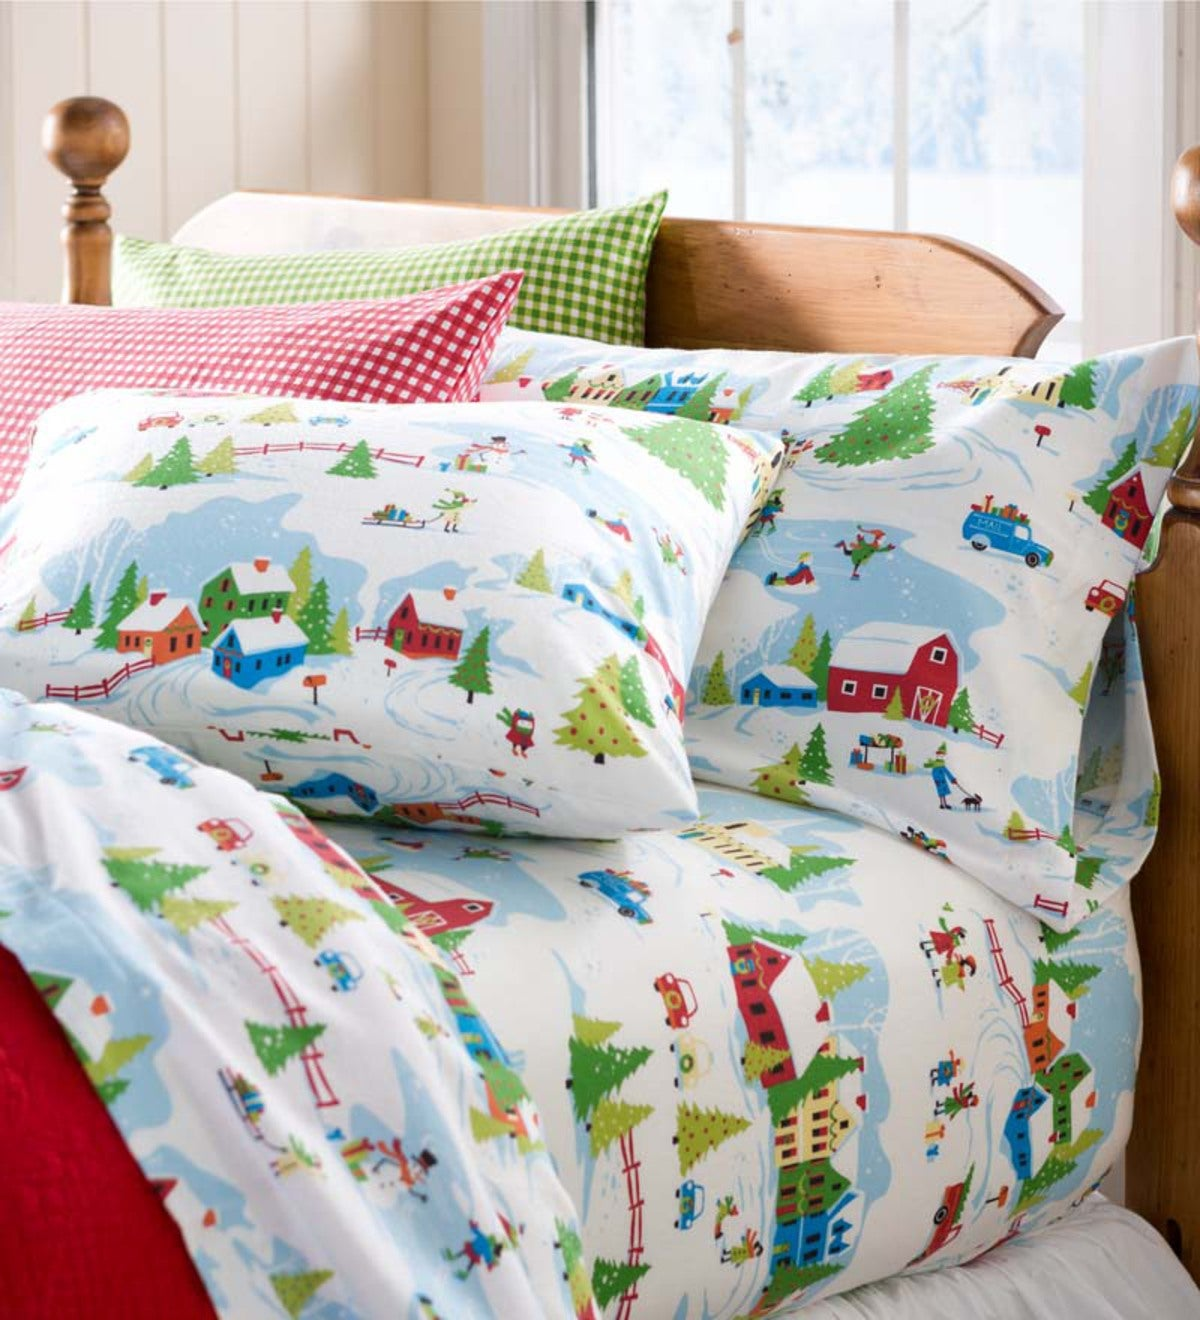 King Winter Wonderland Portuguese Cotton Flannel Sheet Set Plowhearth